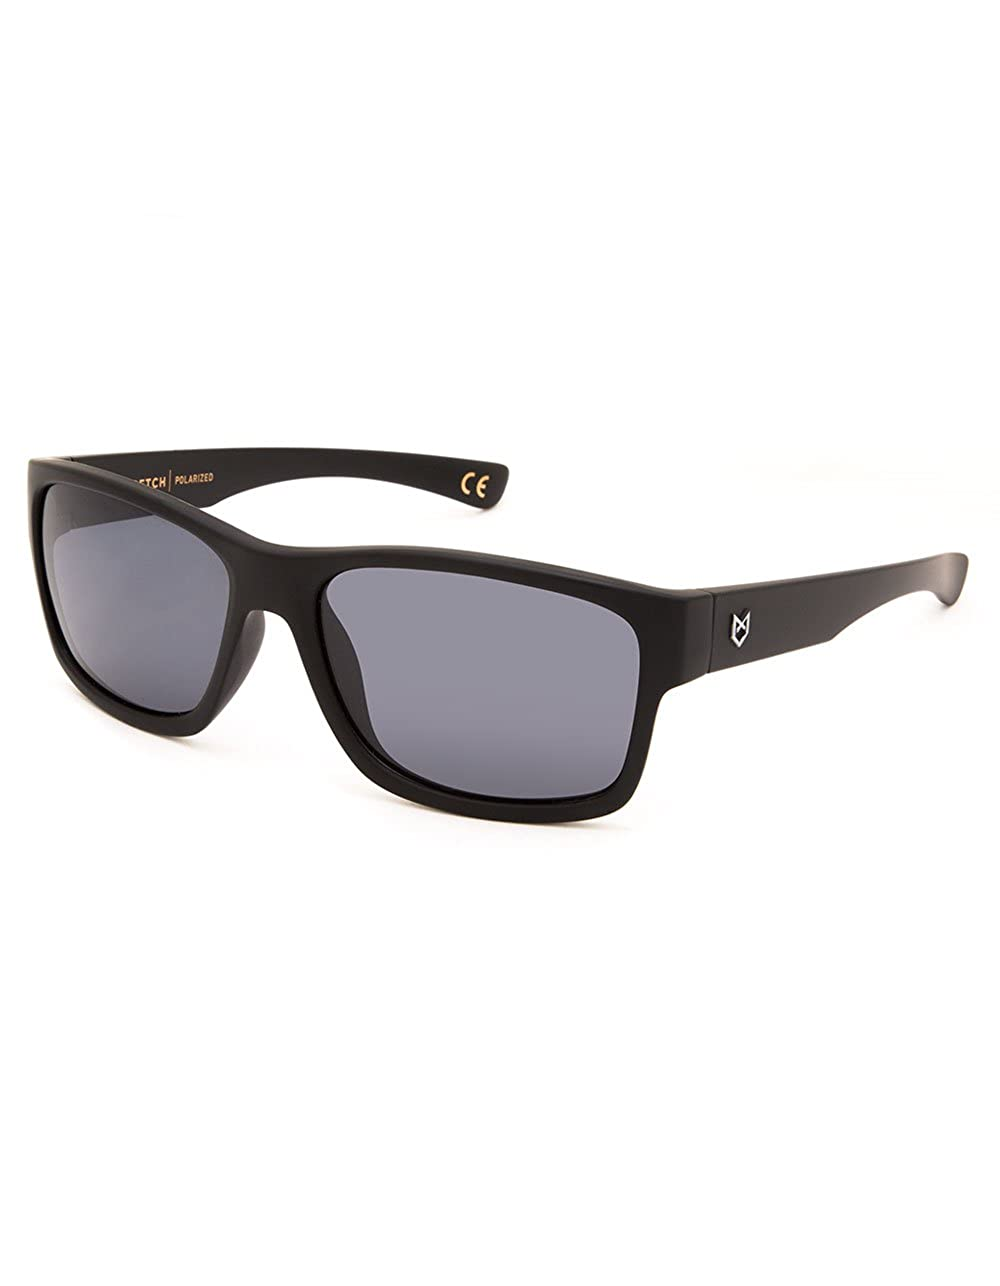 35b1b3d10b1cf Amazon.com  MADSON Stretch Polarized Sunglasses